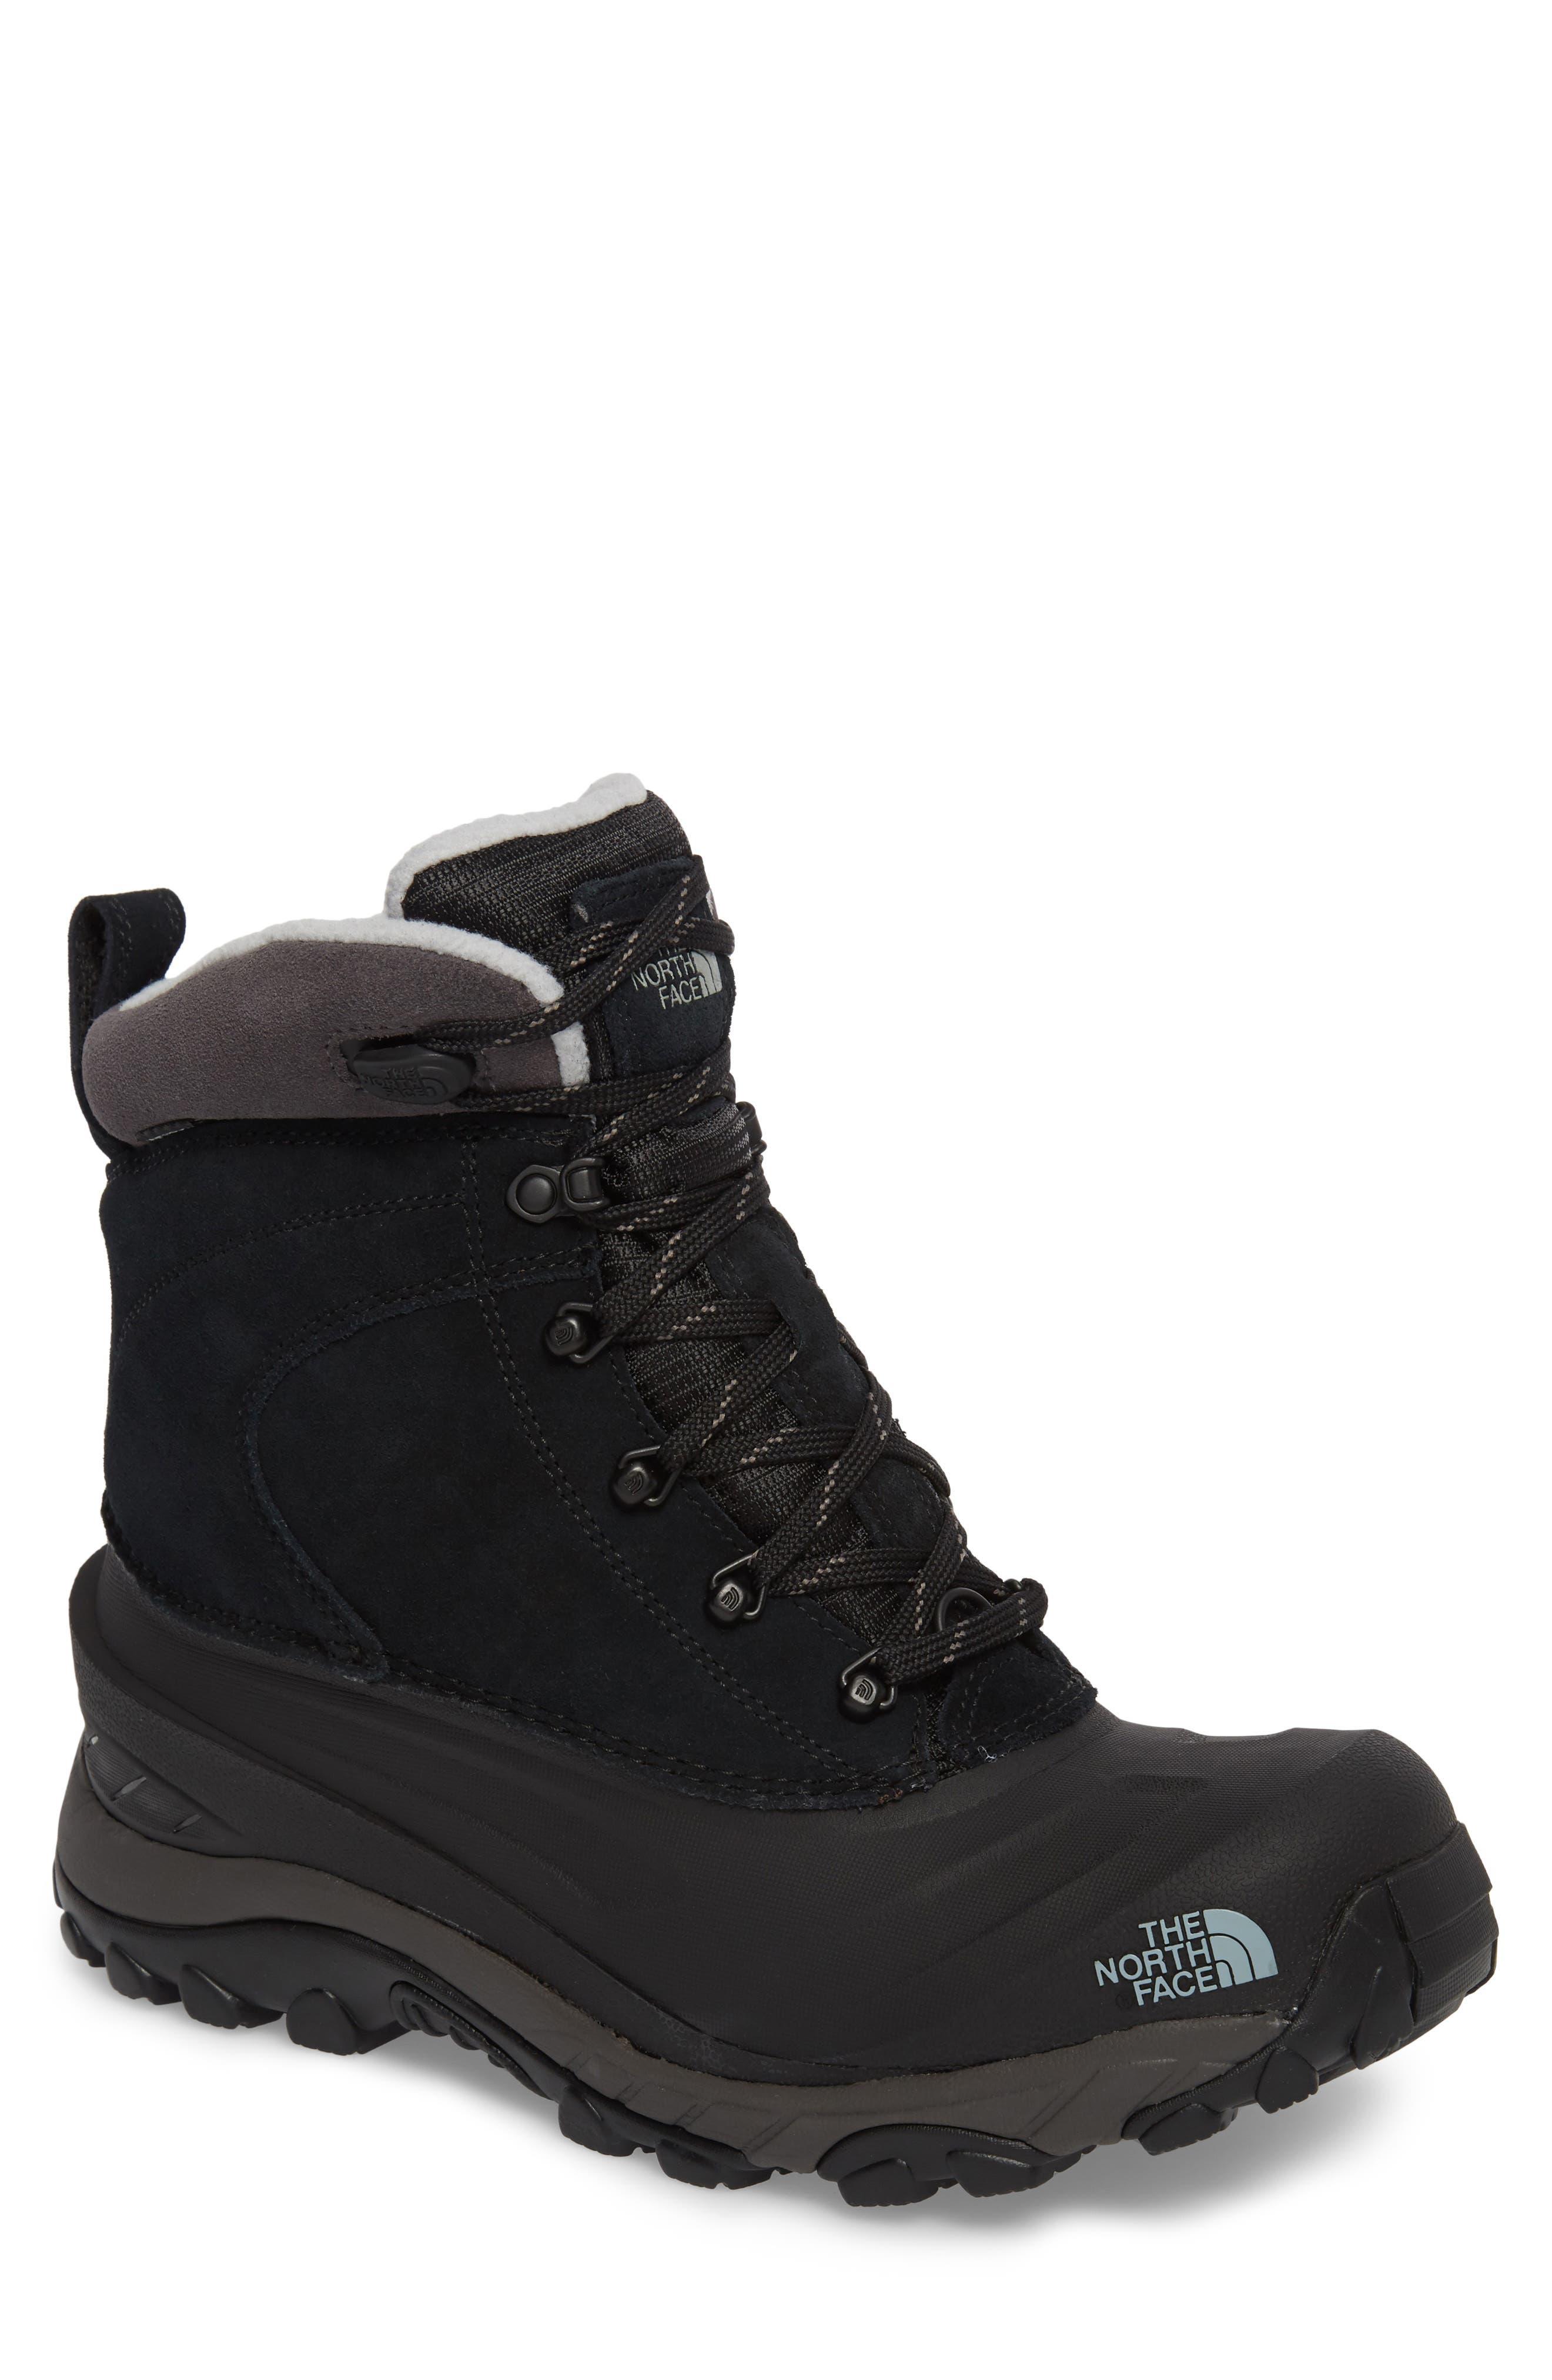 Chilkat III Waterproof Insulated Boot,                         Main,                         color, TNF BLACK